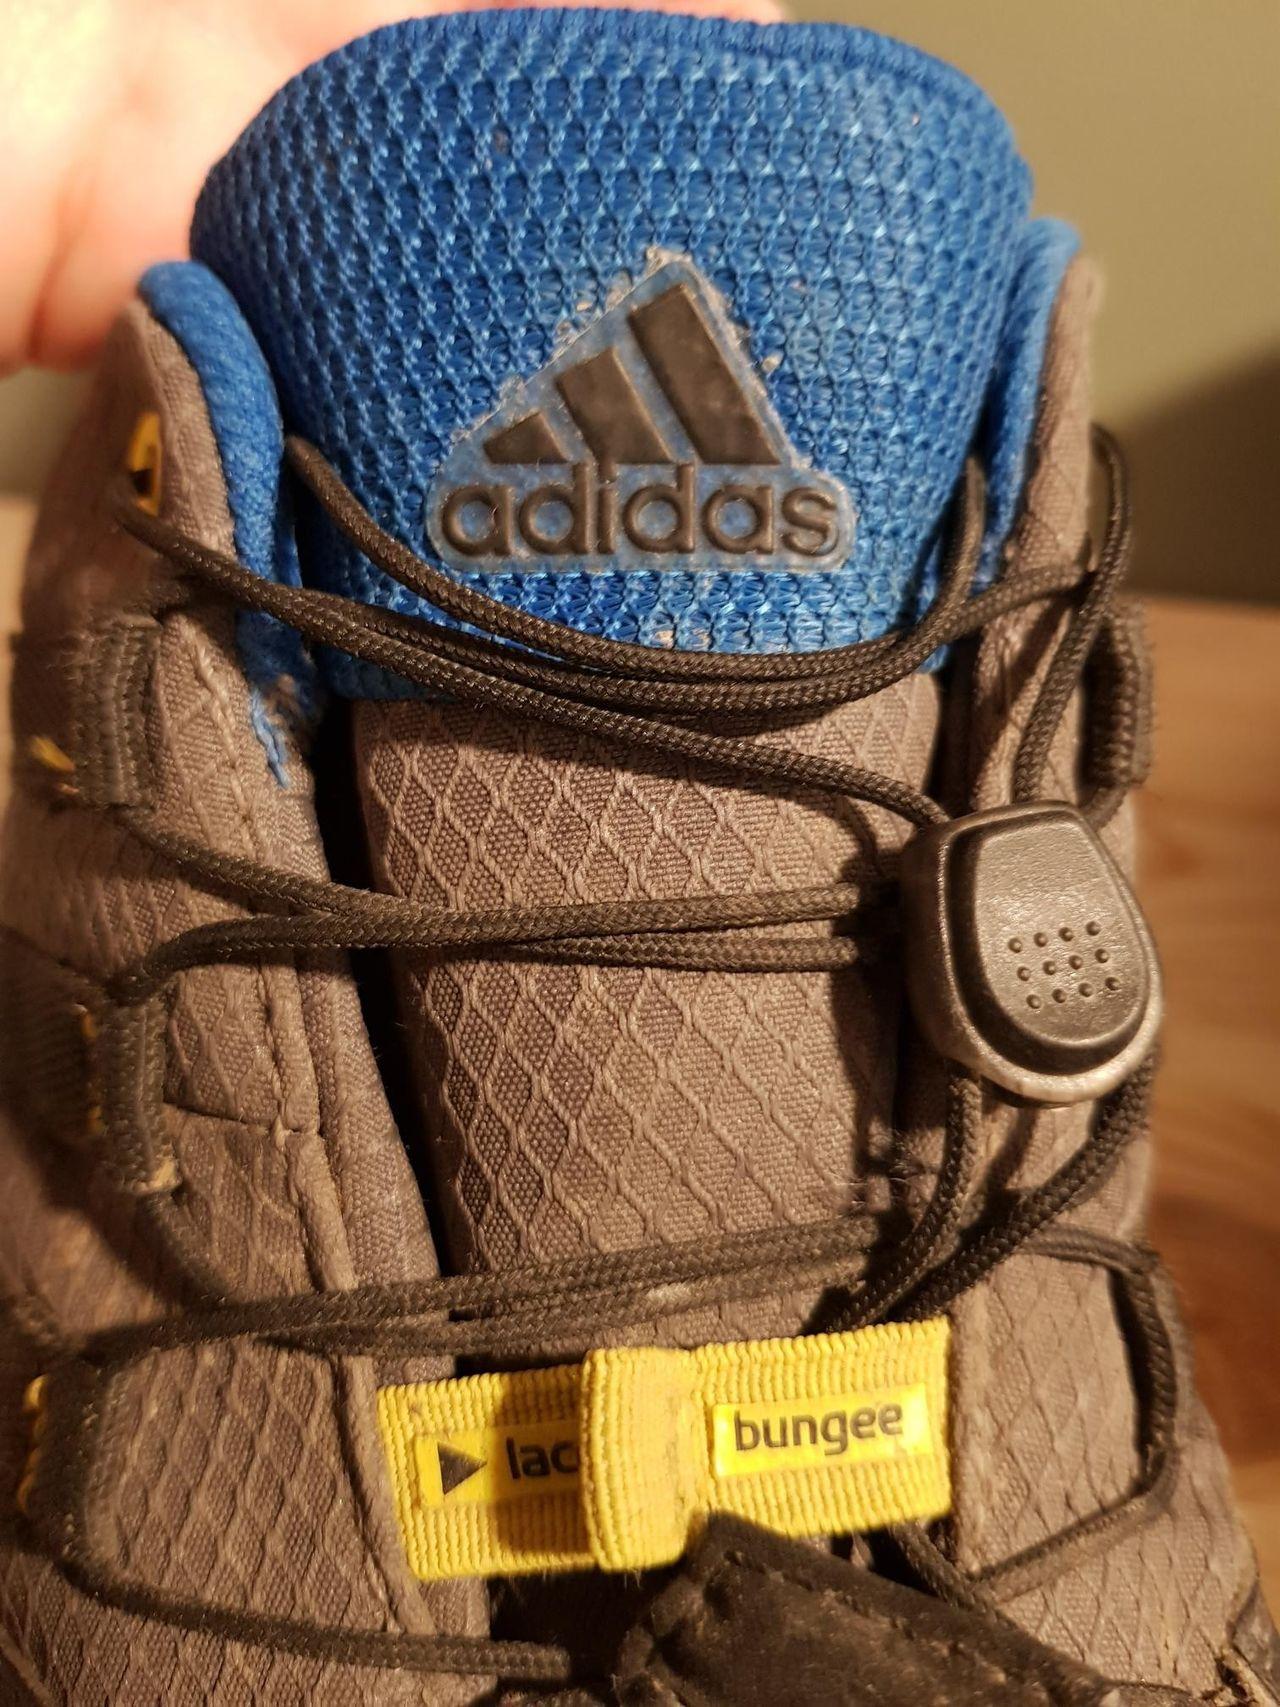 Adidas gore tex sko, høy modell str 36. | FINN.no